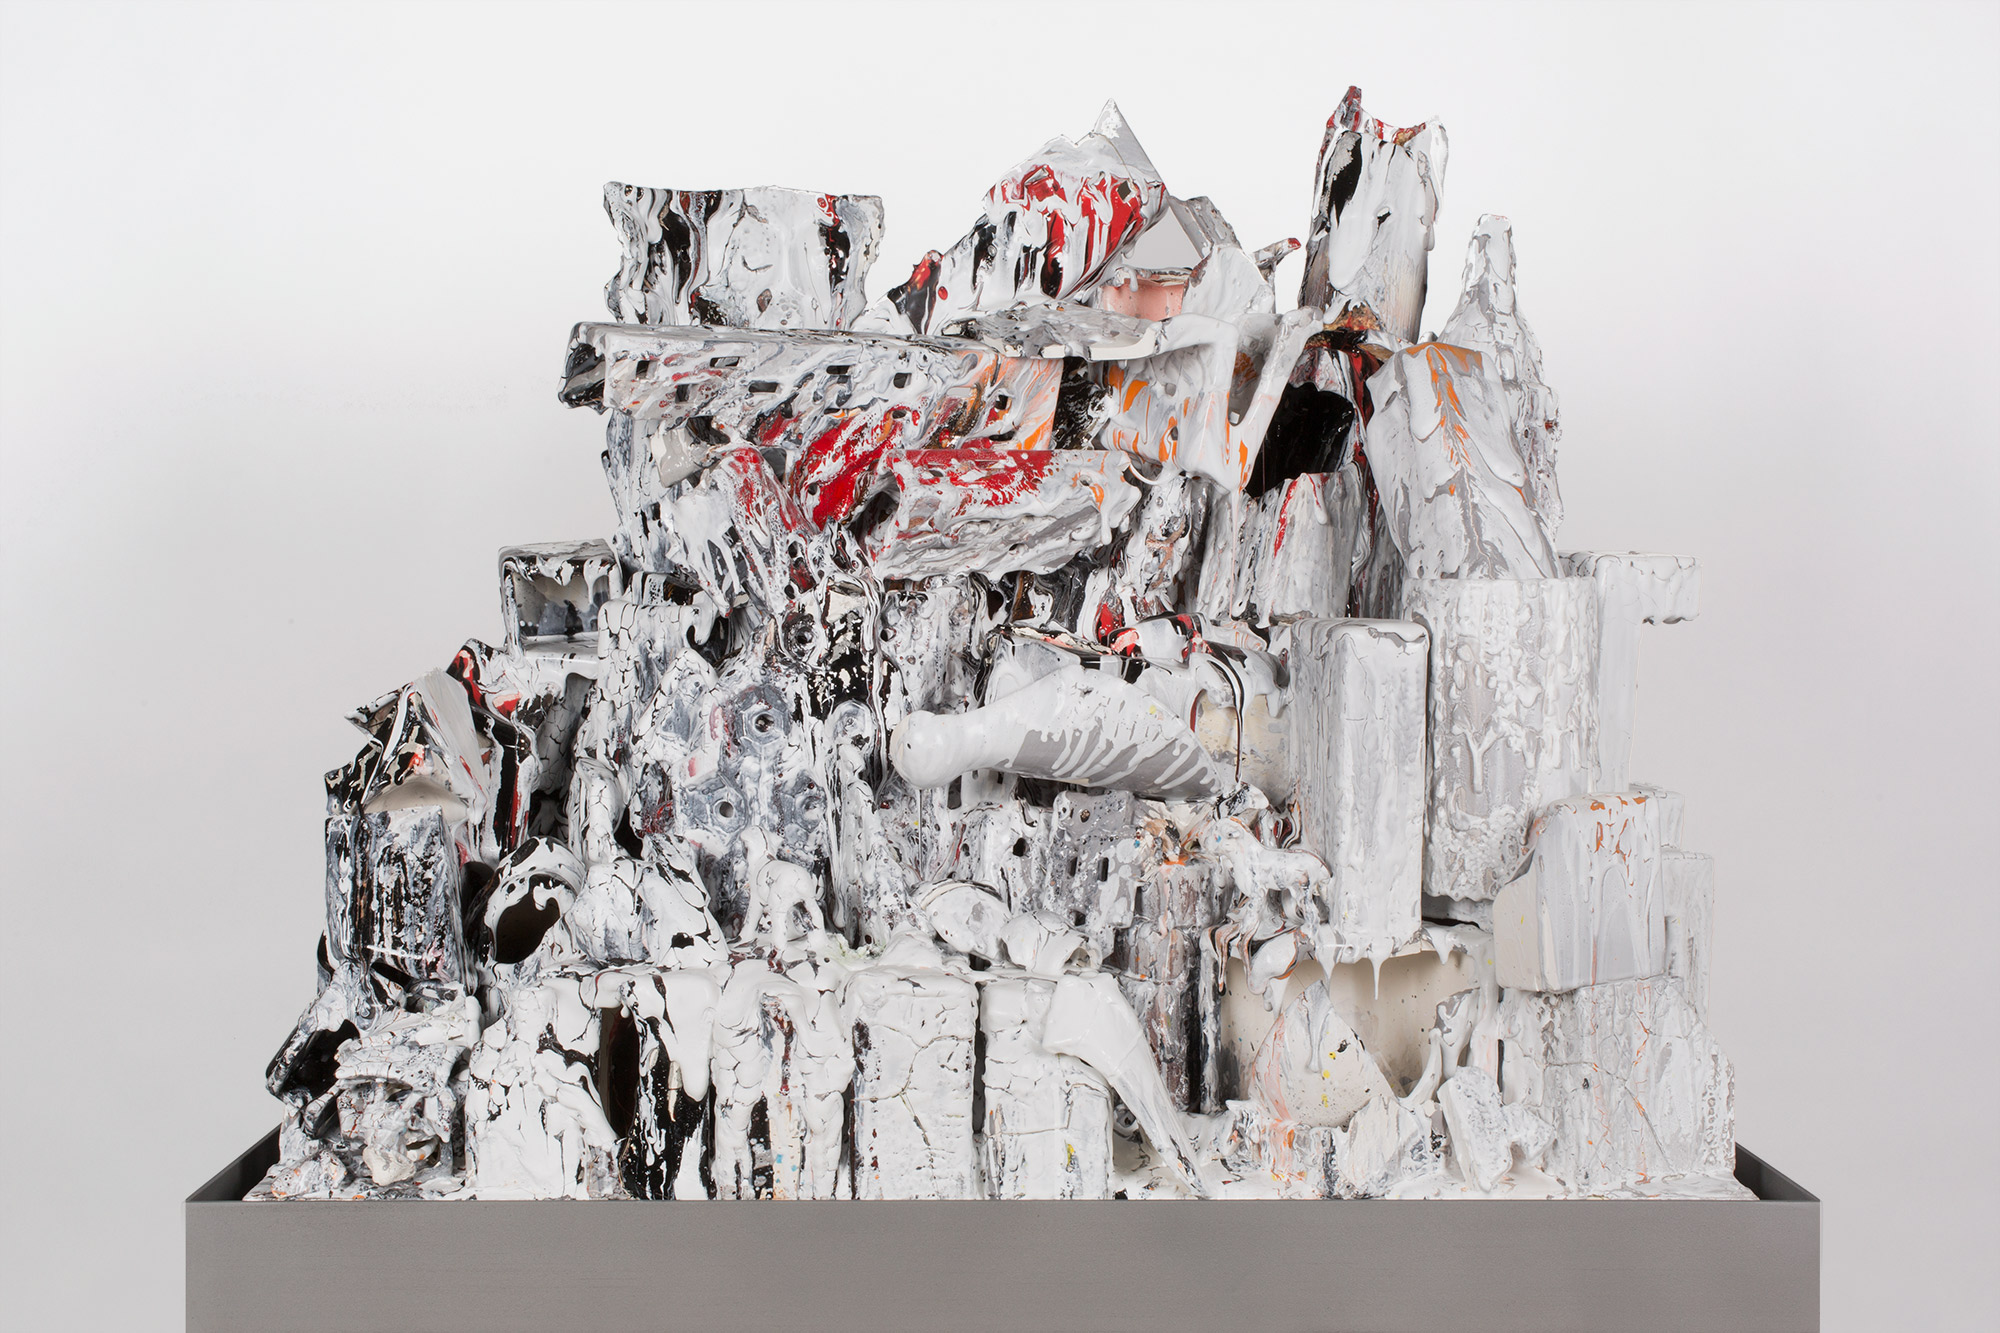 La Ciudad en Llamas (February 17–March 1, 2015: Cerámica Suro Contemporánea, Guadalajara, Jalisco, Mexico)    2015   Ceramica Suro slip cast remnants, glaze, and firing plate  54 x 42 x 26 1/2 inches   All the World's Futures, 2015